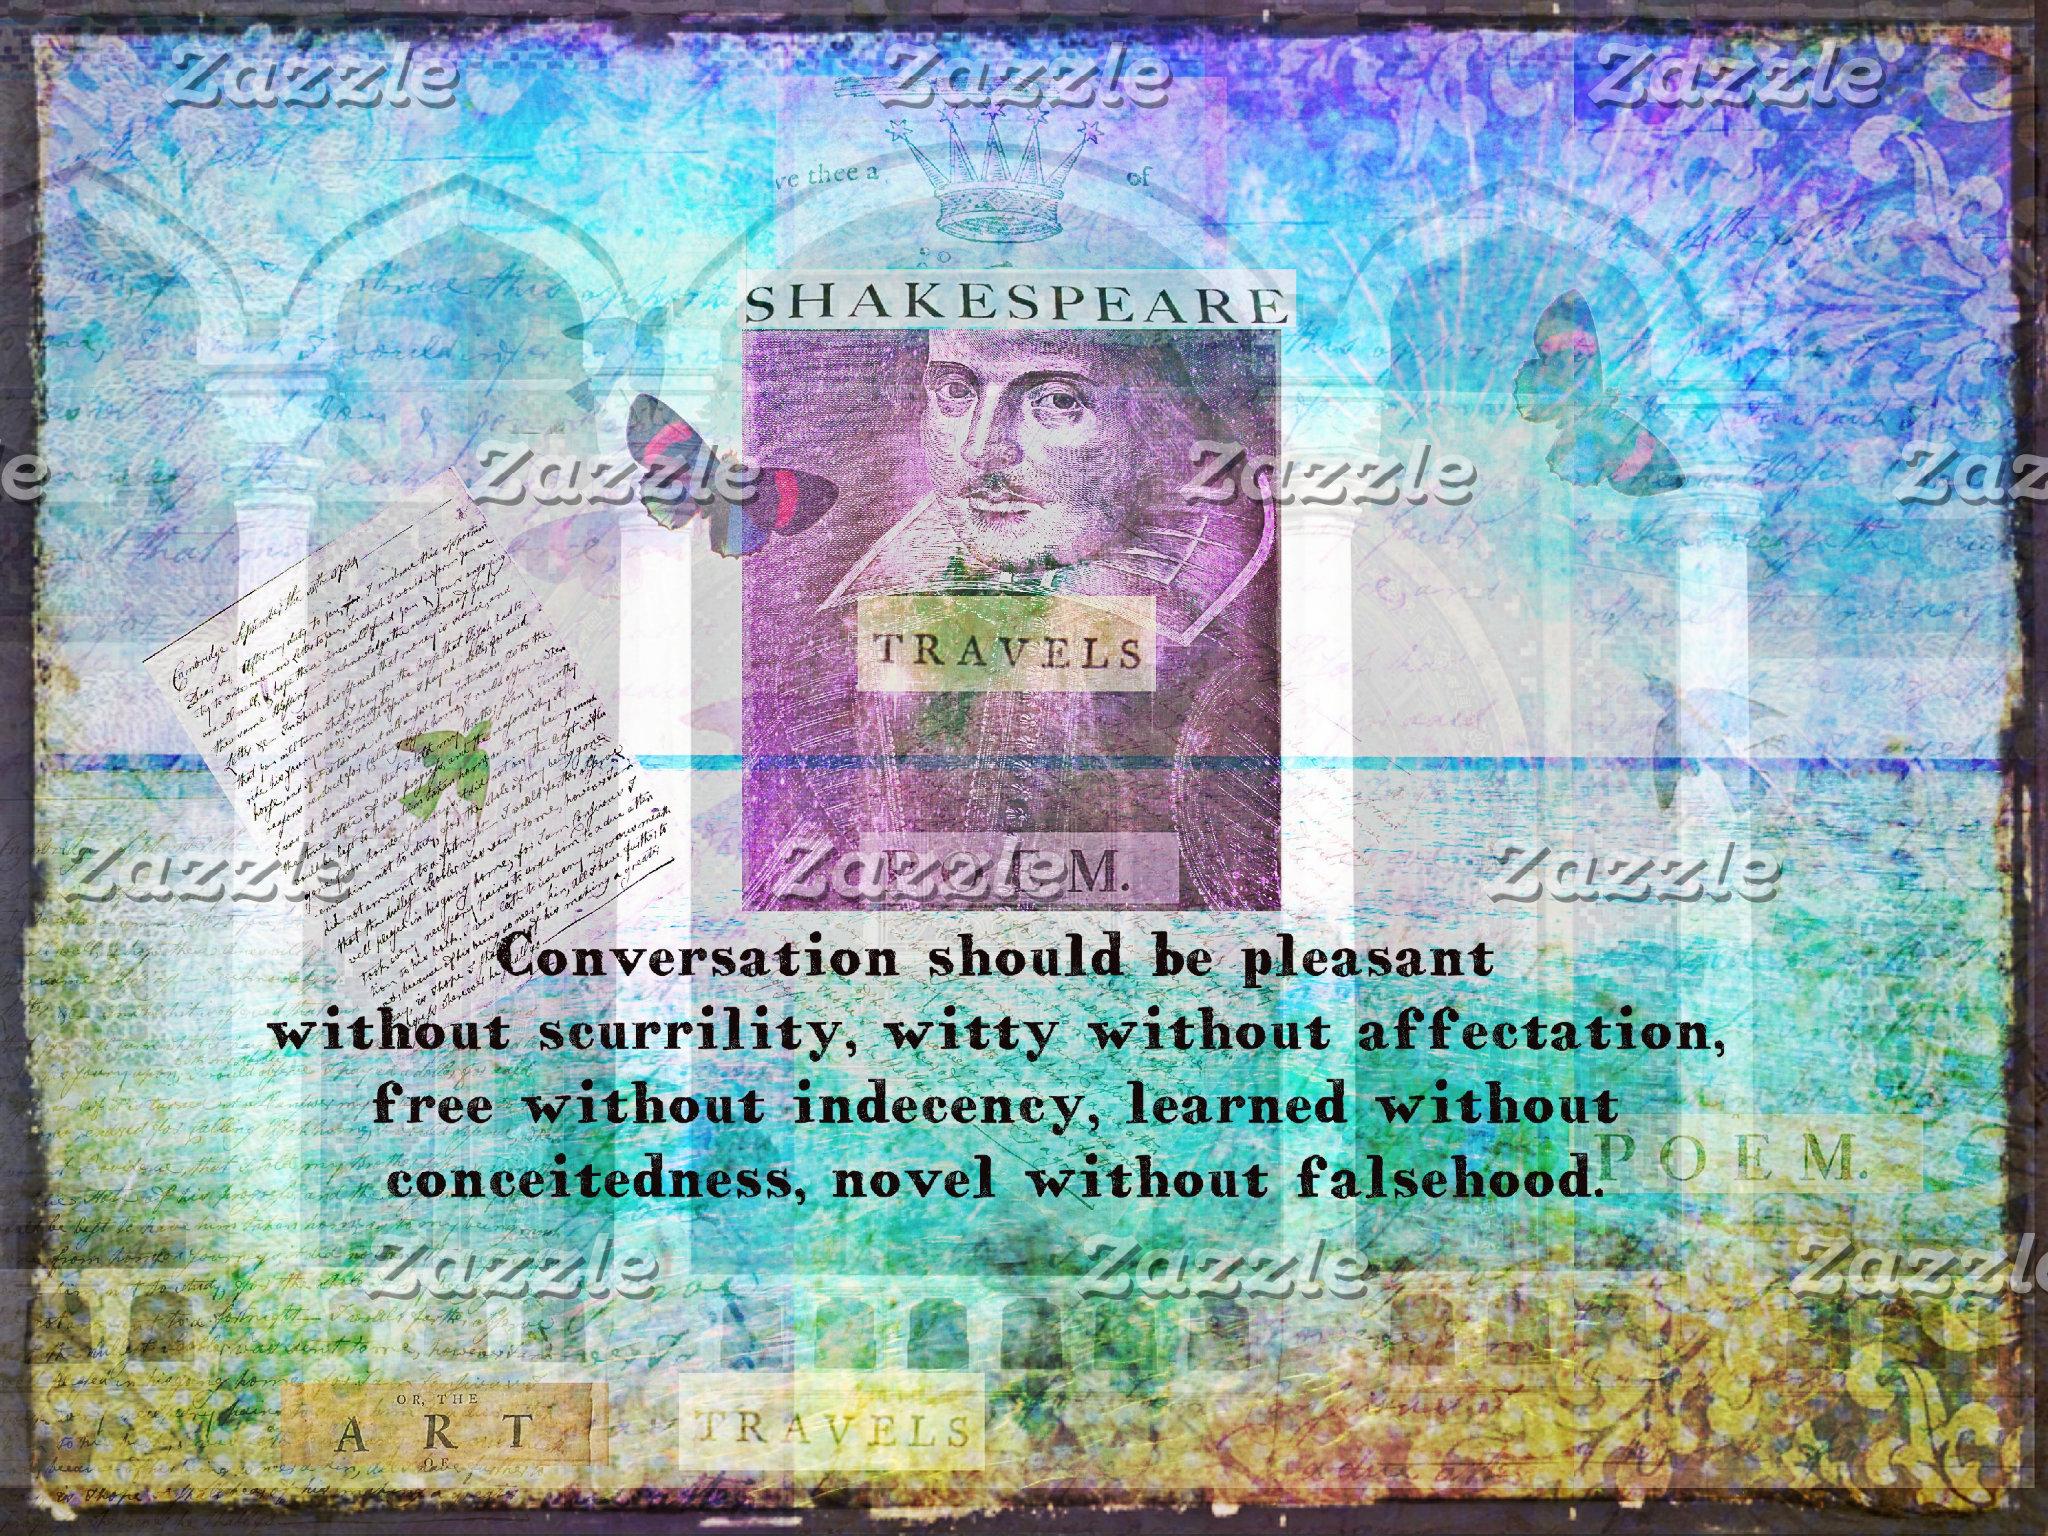 Conversation should be pleasant without scurrility